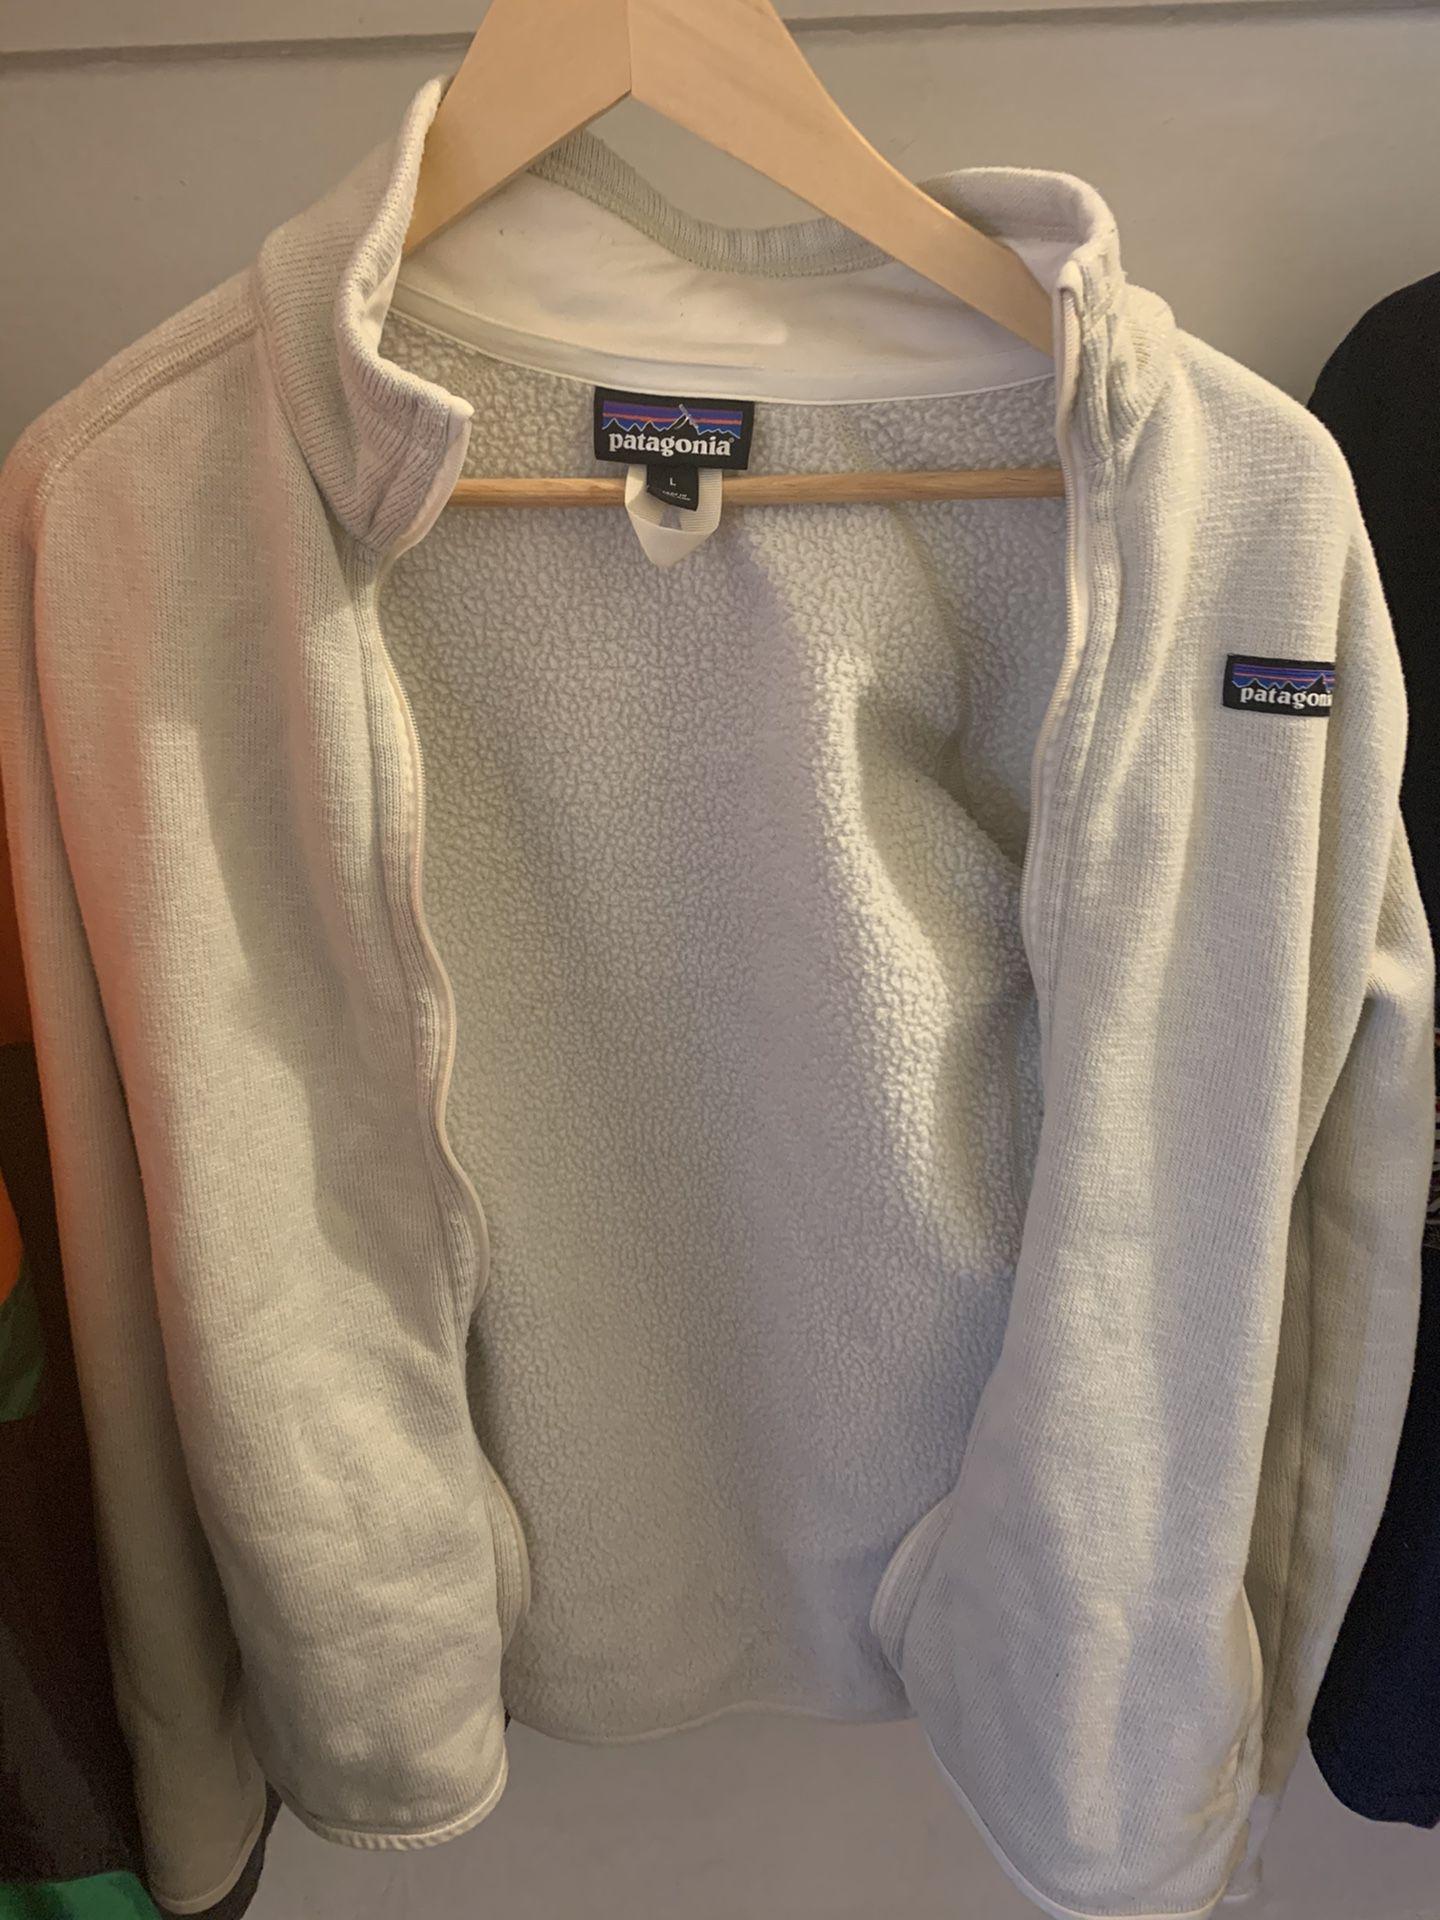 Mens Patagonia Fleece Jacket White Size L